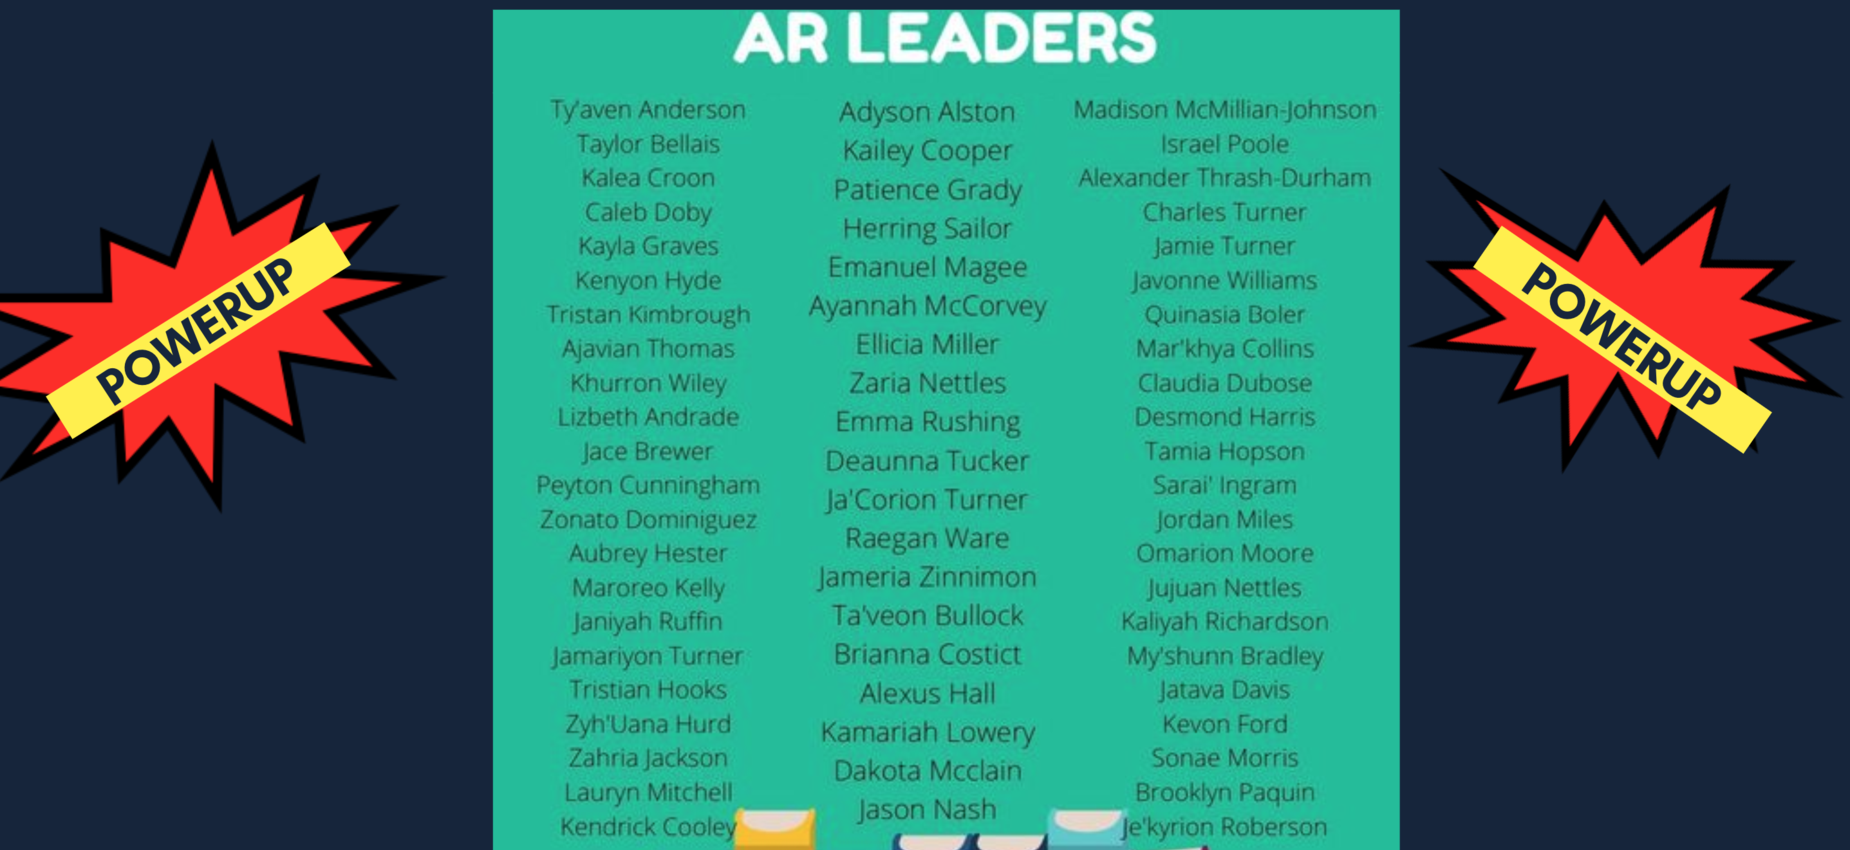 AR LEADERS